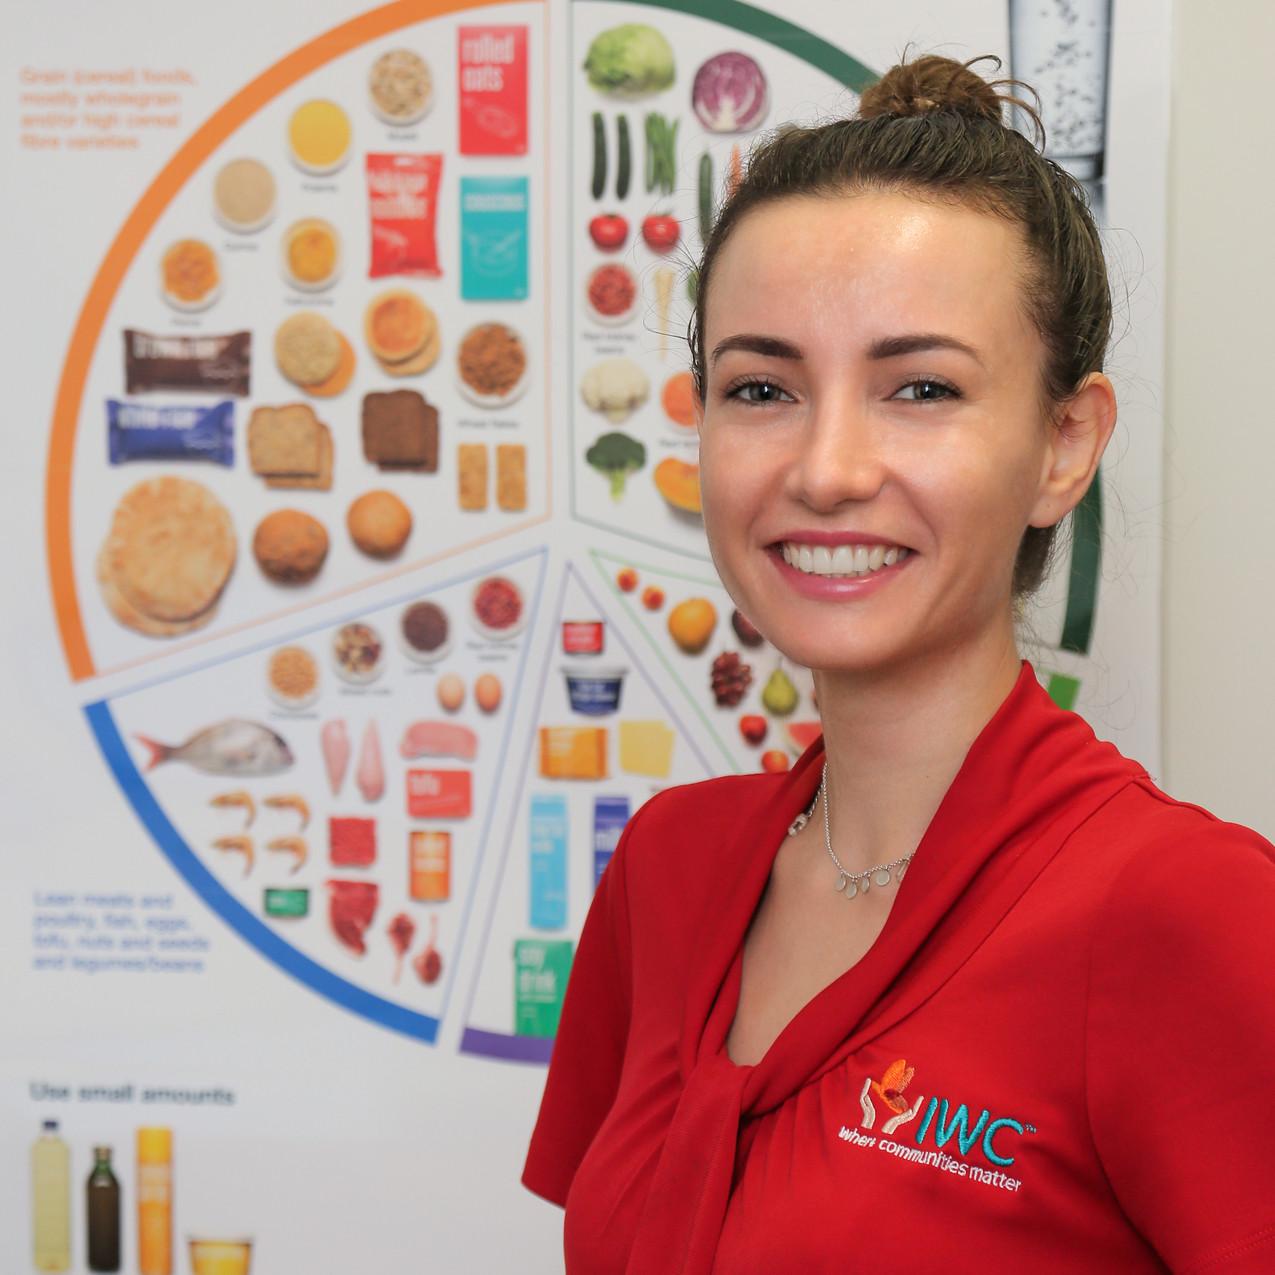 IWC Accredited Practising Dietitian Nata